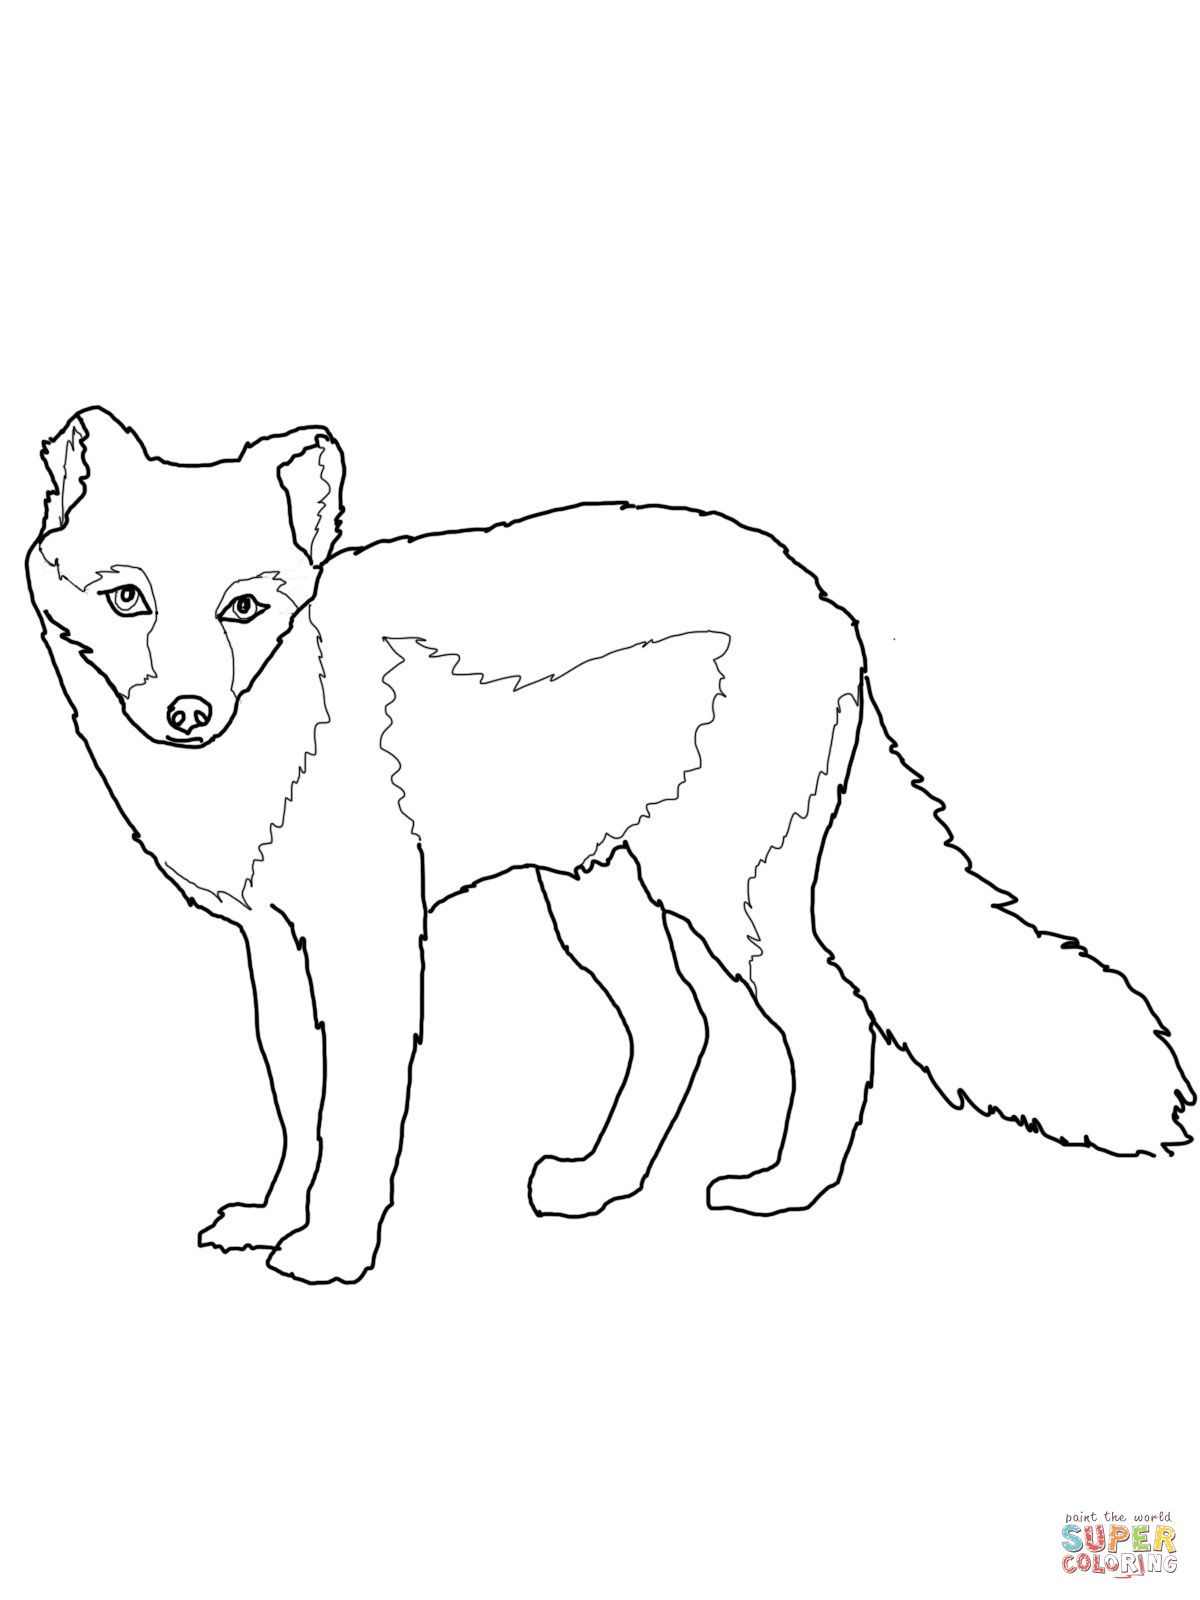 Arctic Fox Summer Coat Coloring Page Jpg 1200 1600 Fox Coloring Page Cat Coloring Page Coloring Pages